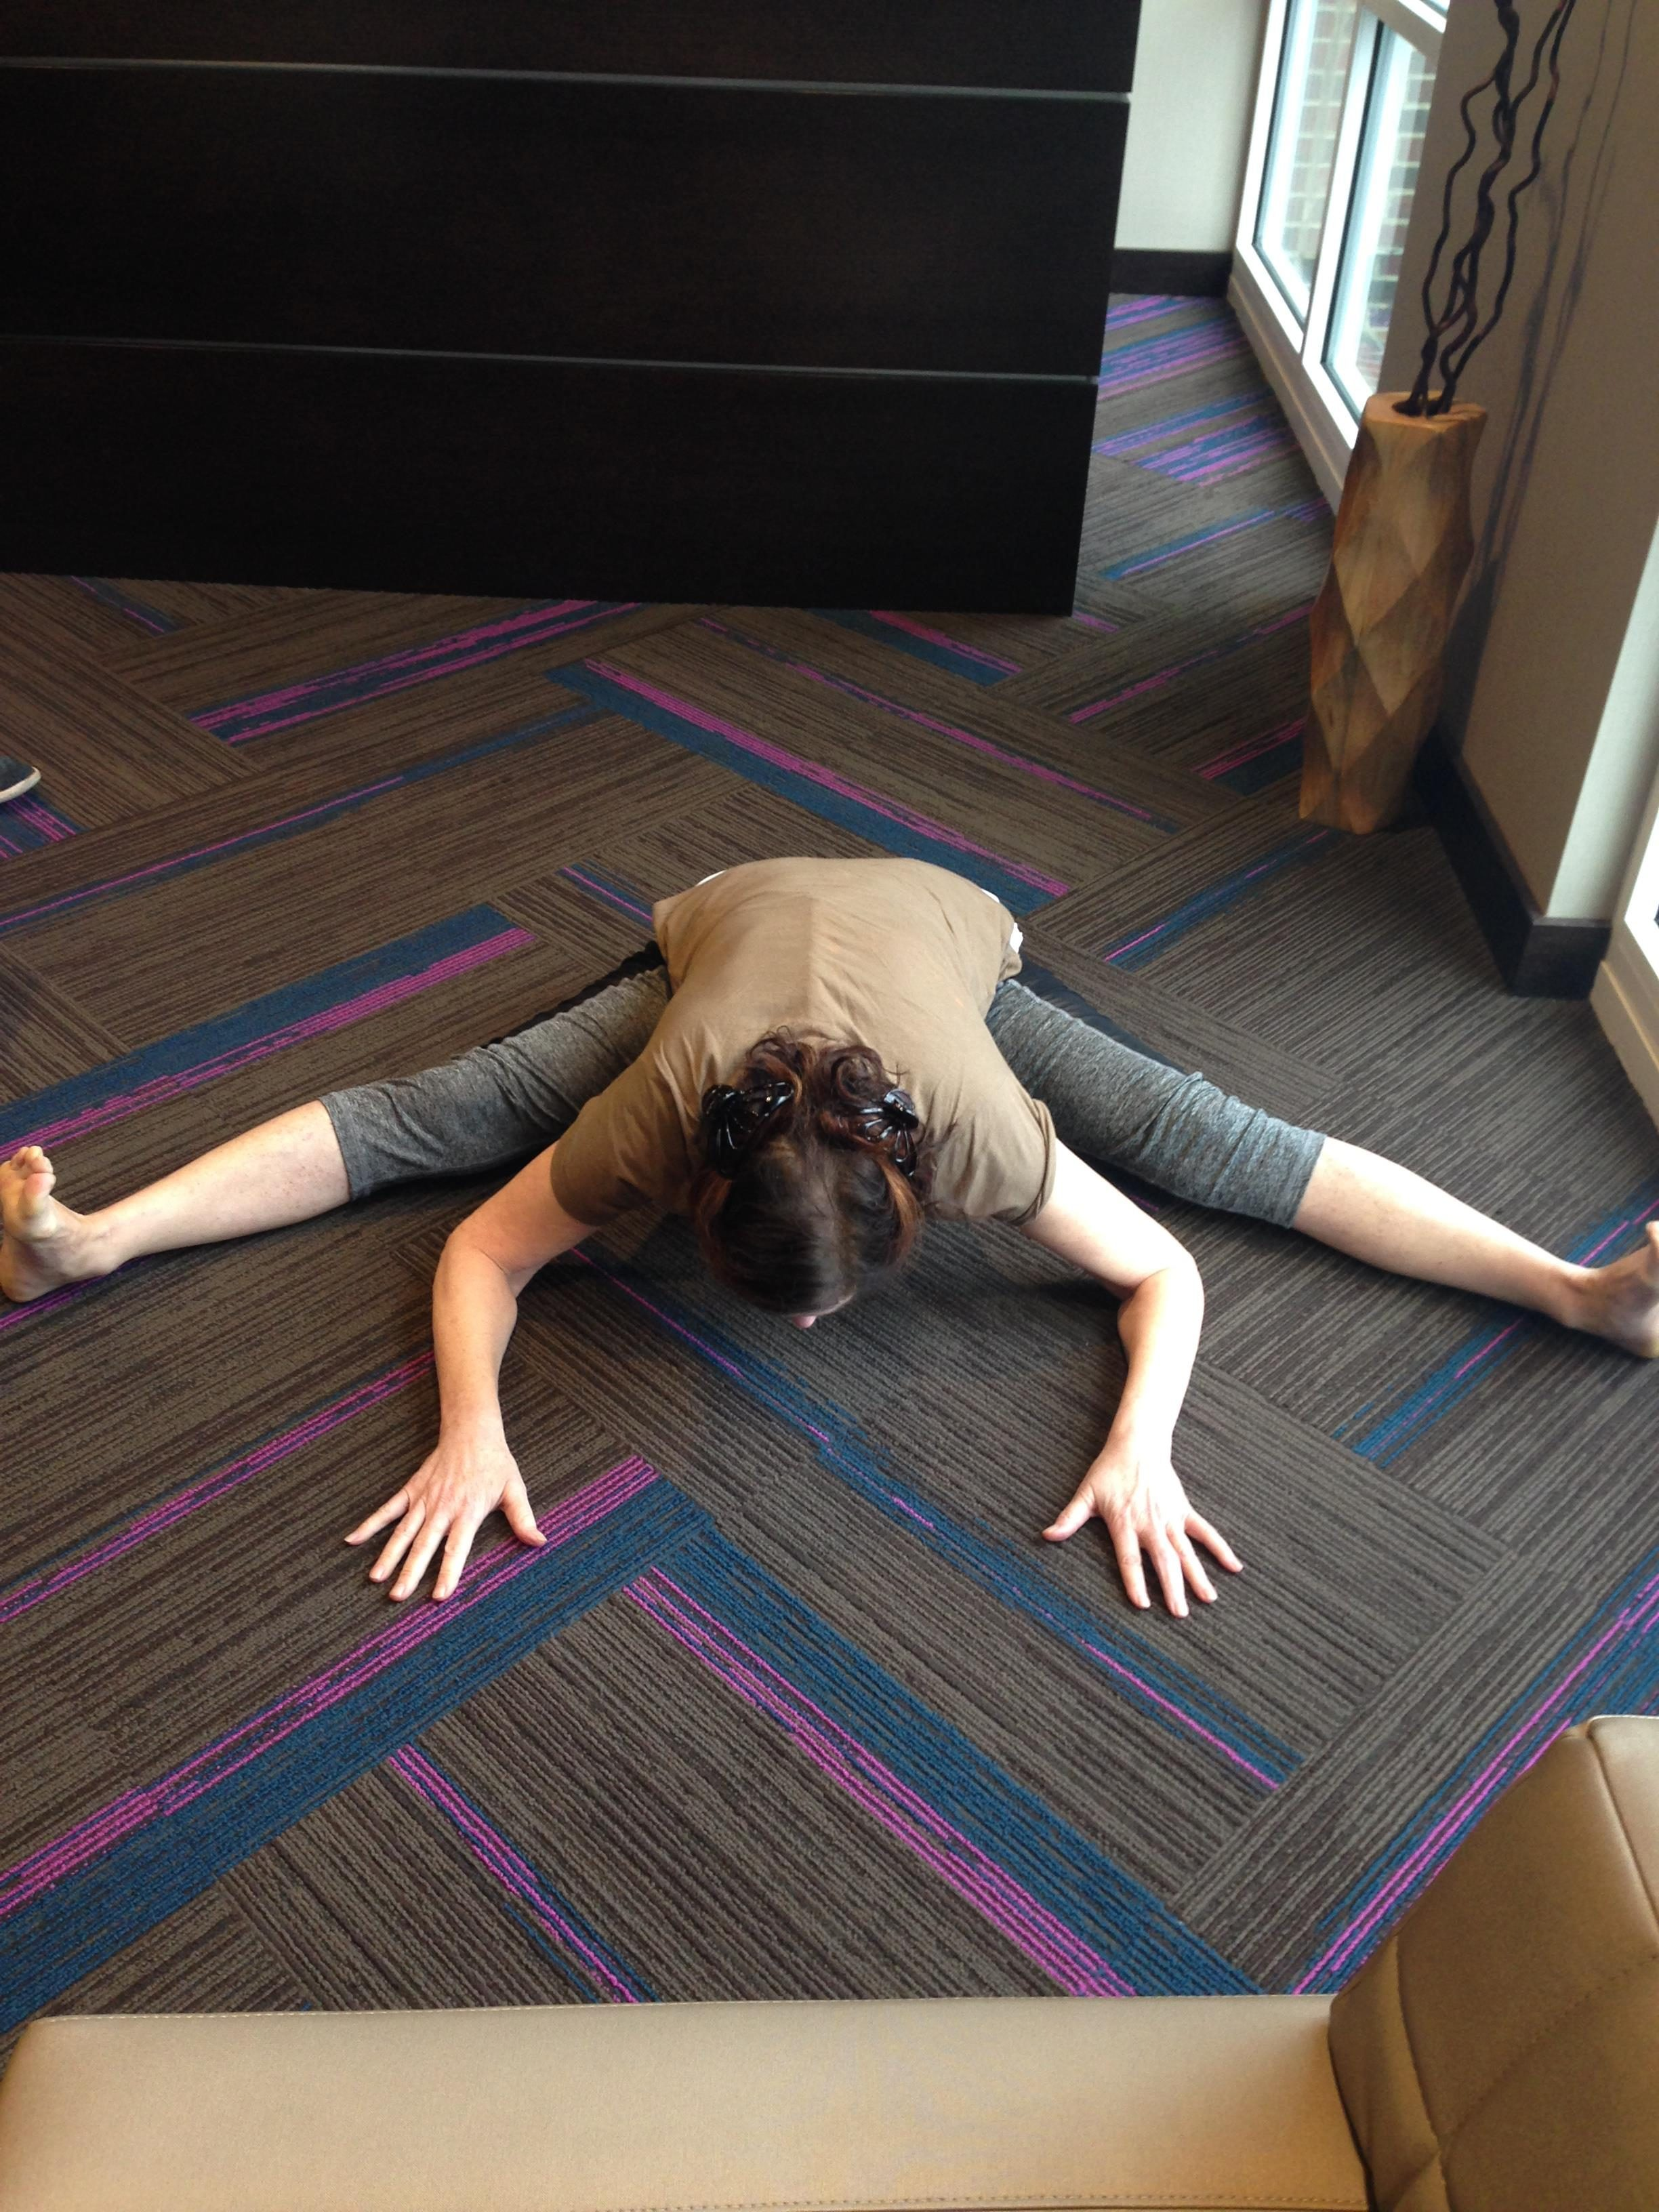 a youthful mind and body yoga pose